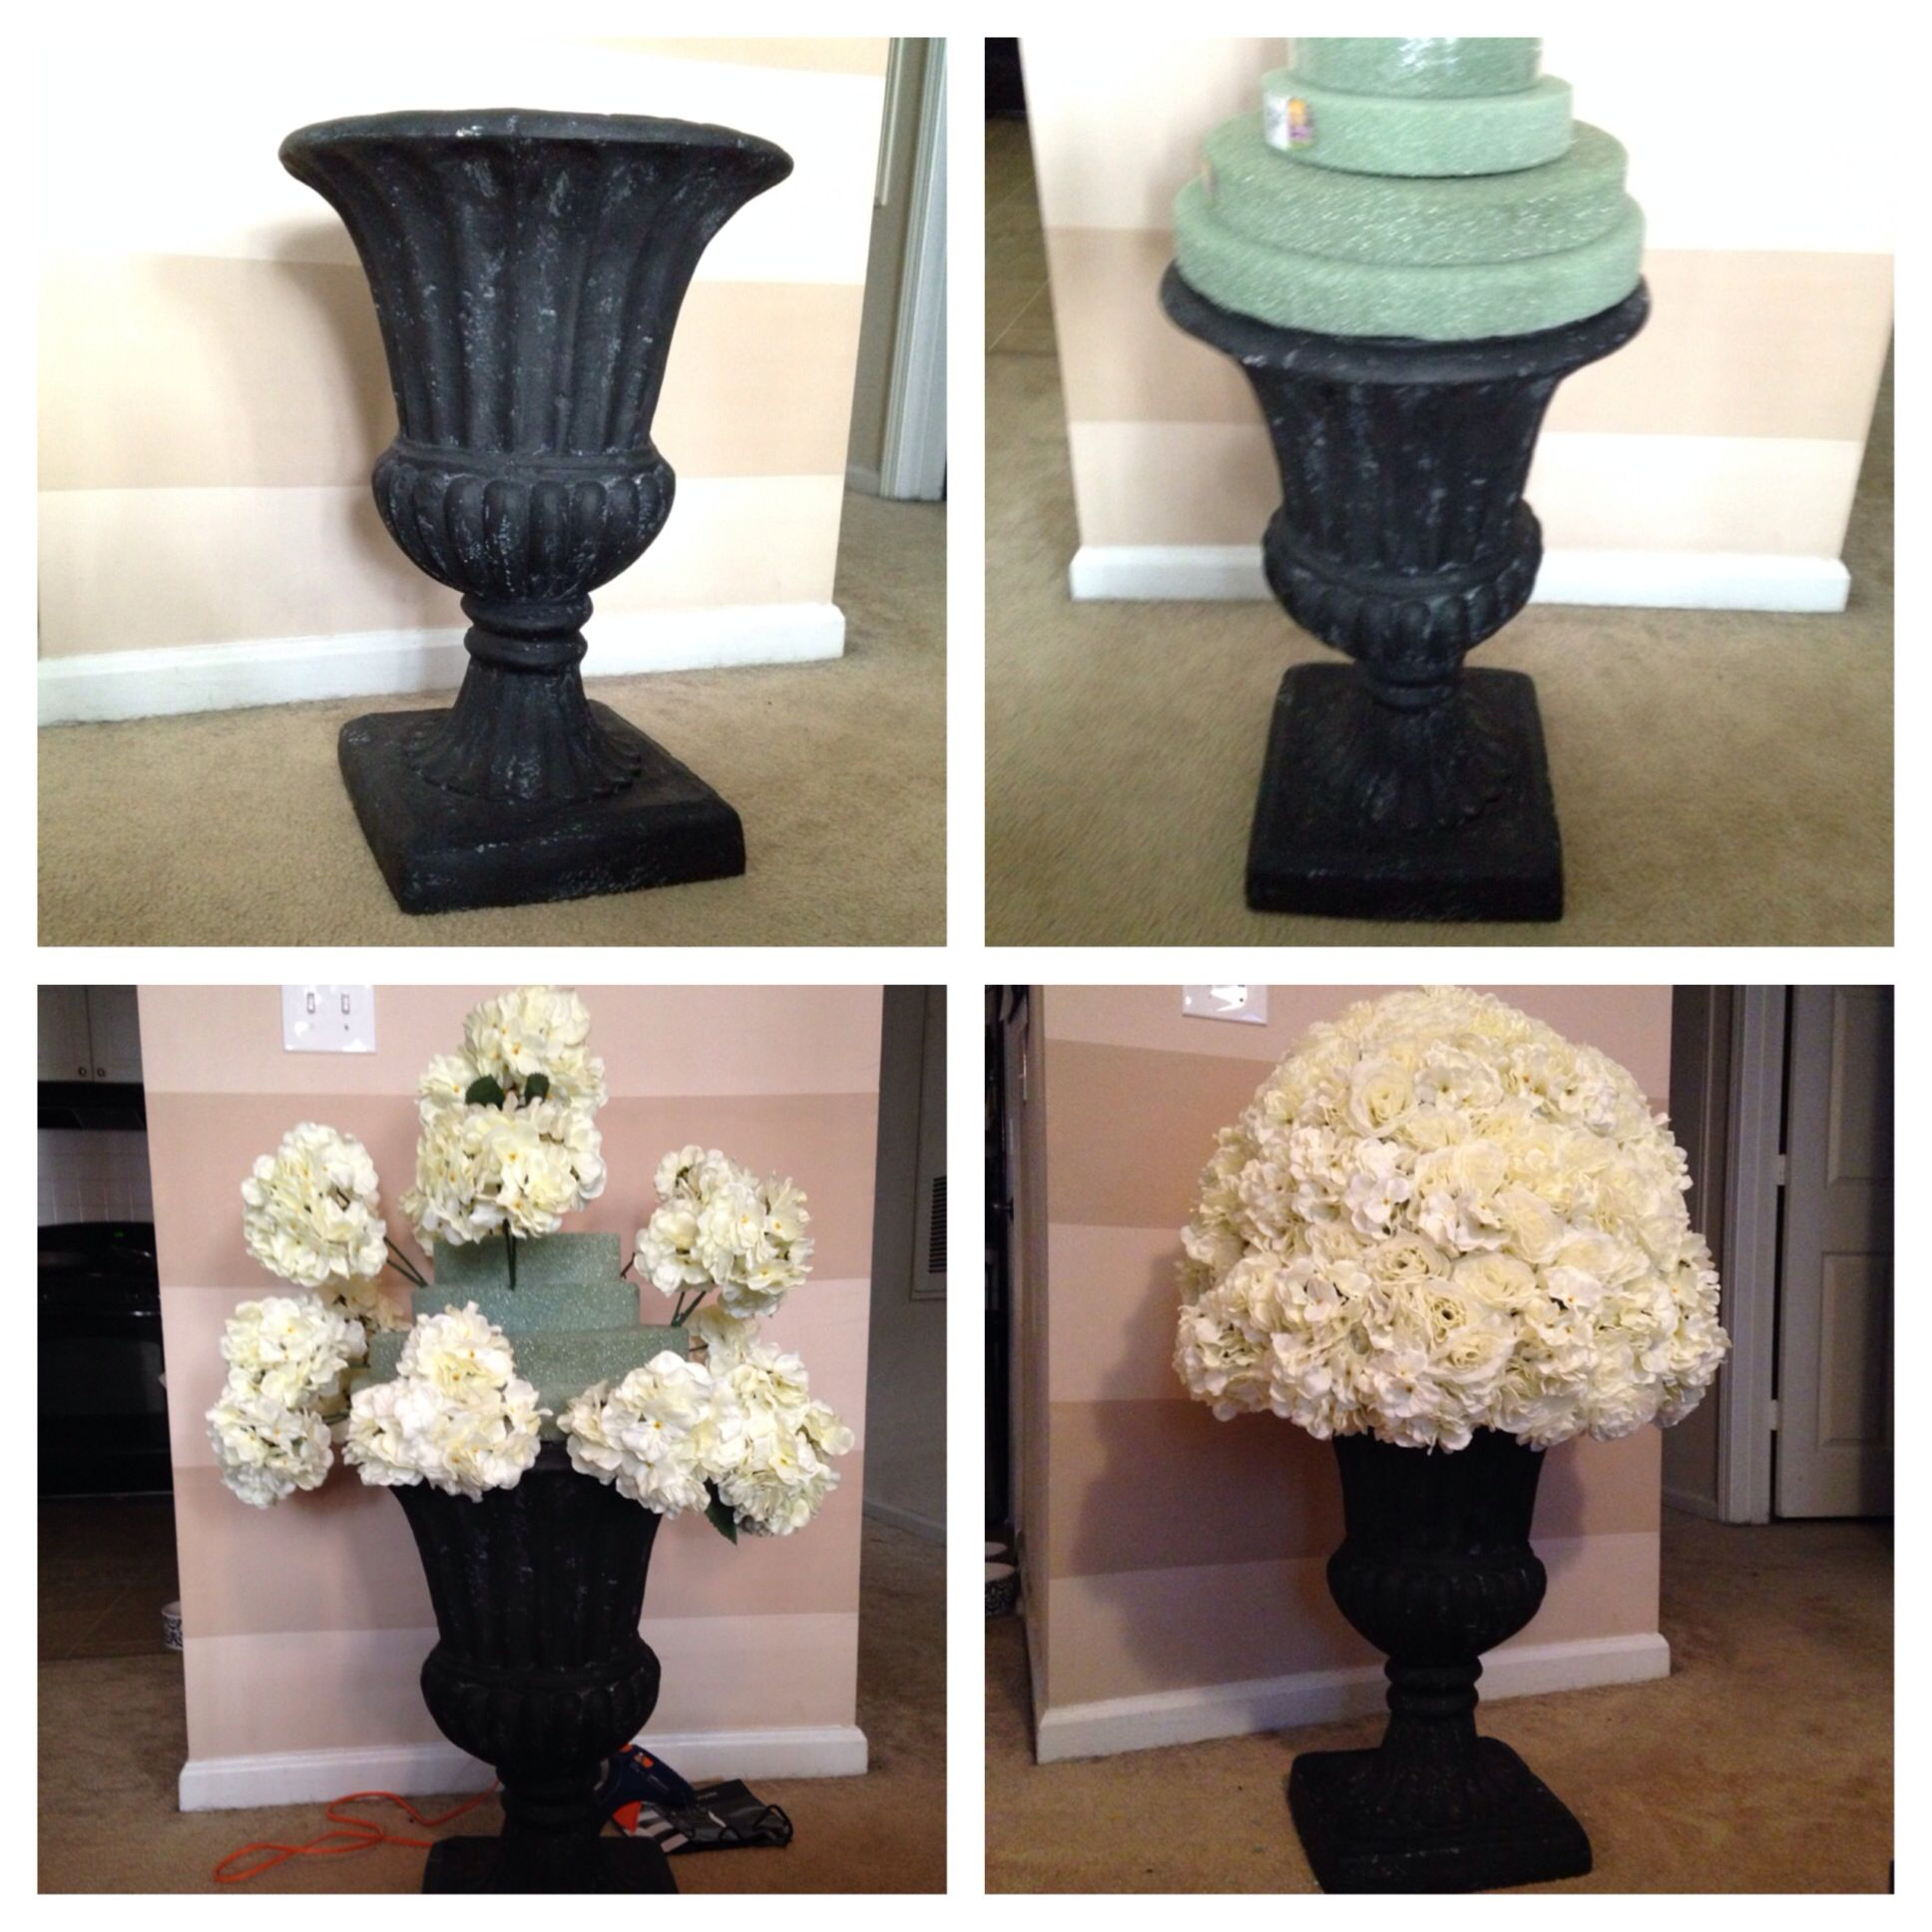 Floral Urns For Weddings: DIY: Urn, Fake Wedding Flowers, Garden Urn, DIY Aisle